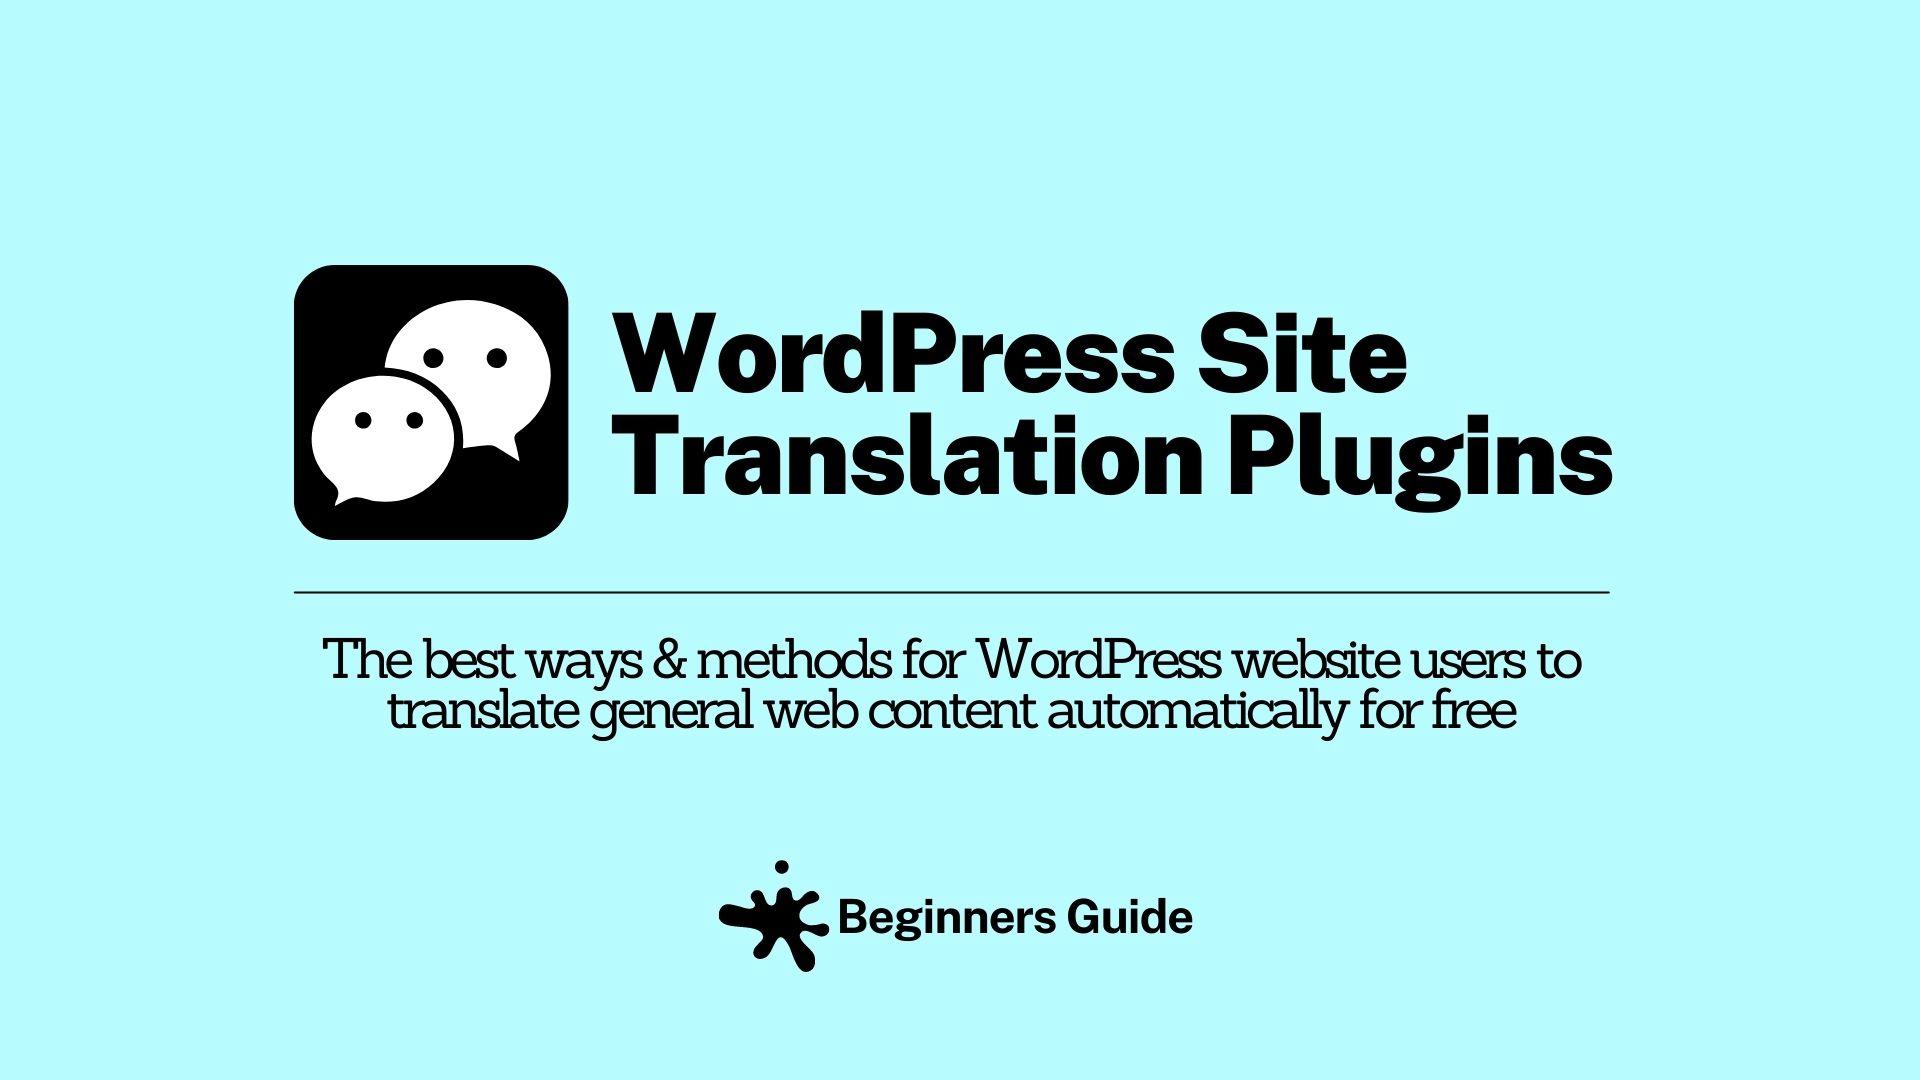 What Are WordPress Translation Plugins?